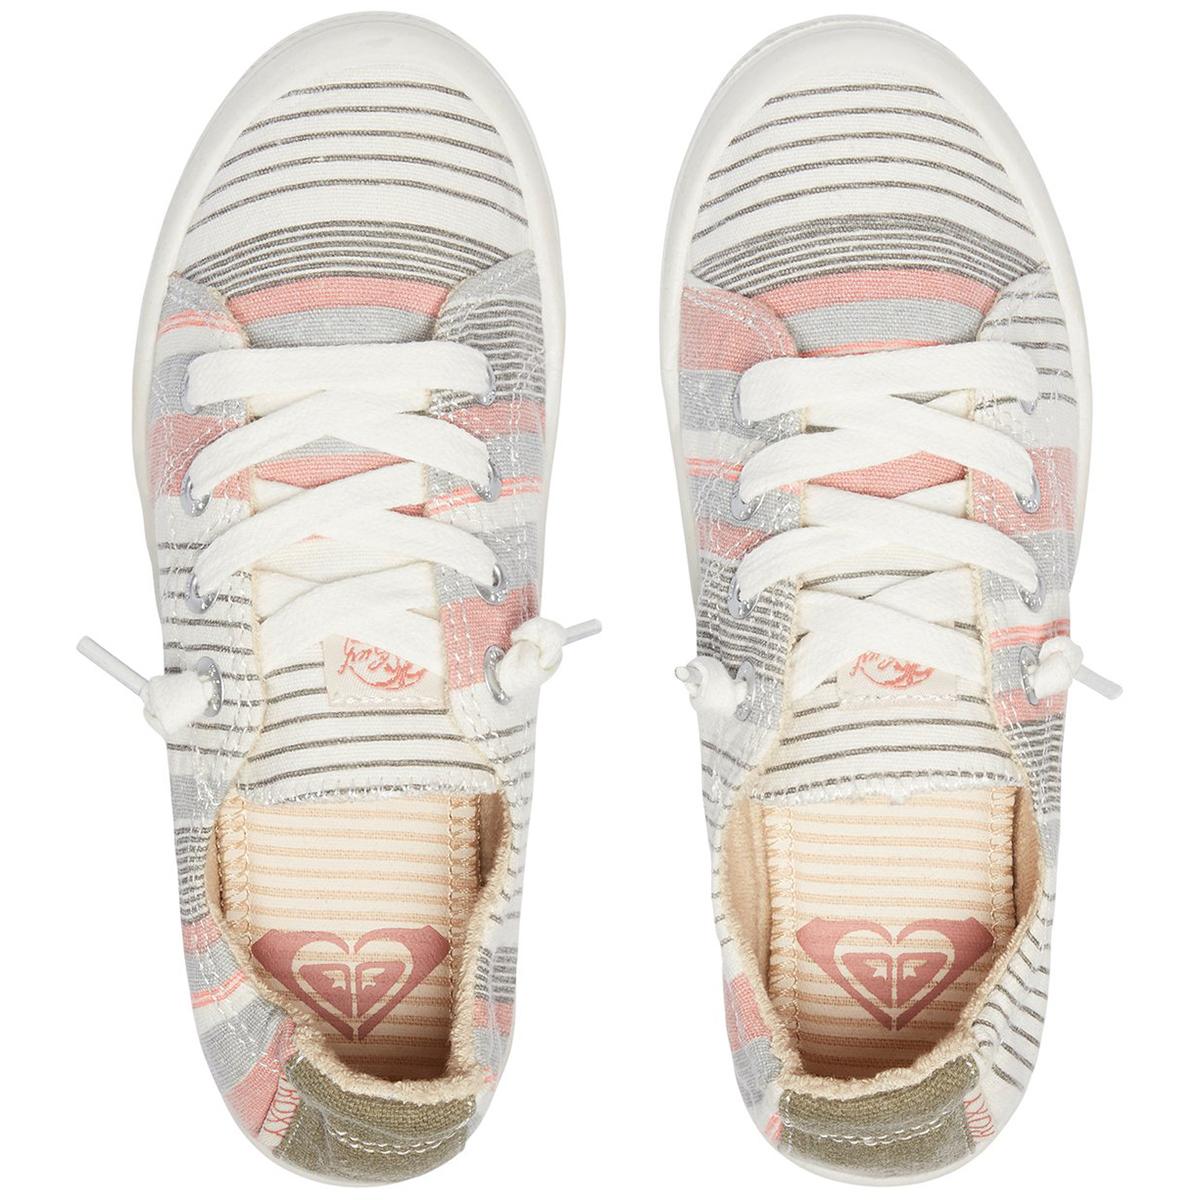 ROXY Girls' Bayshore III Multi-Stripe